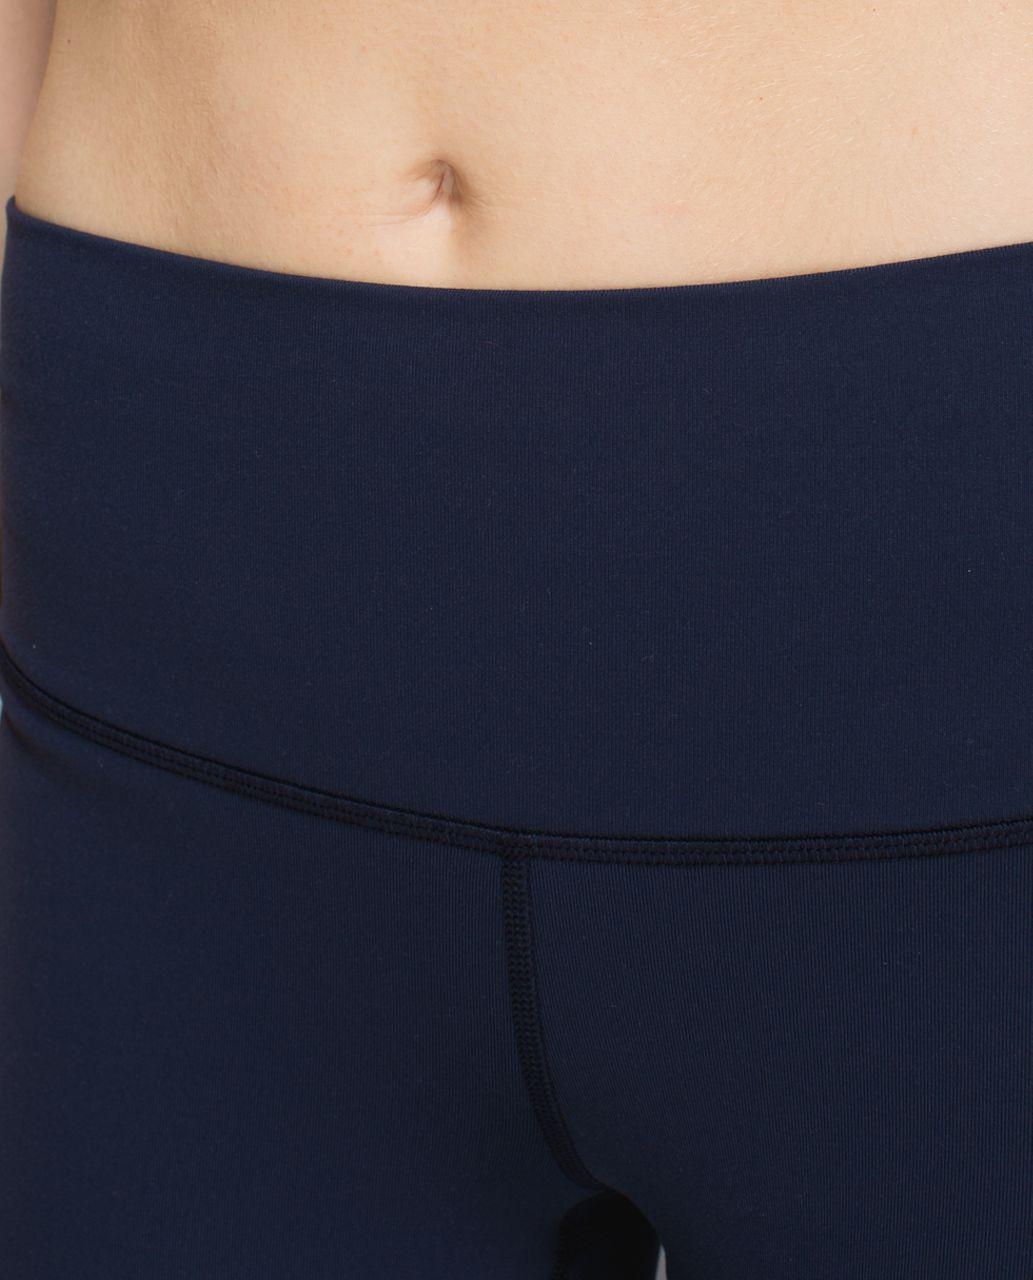 Lululemon High Times Pant *Full-On Luon - Inkwell